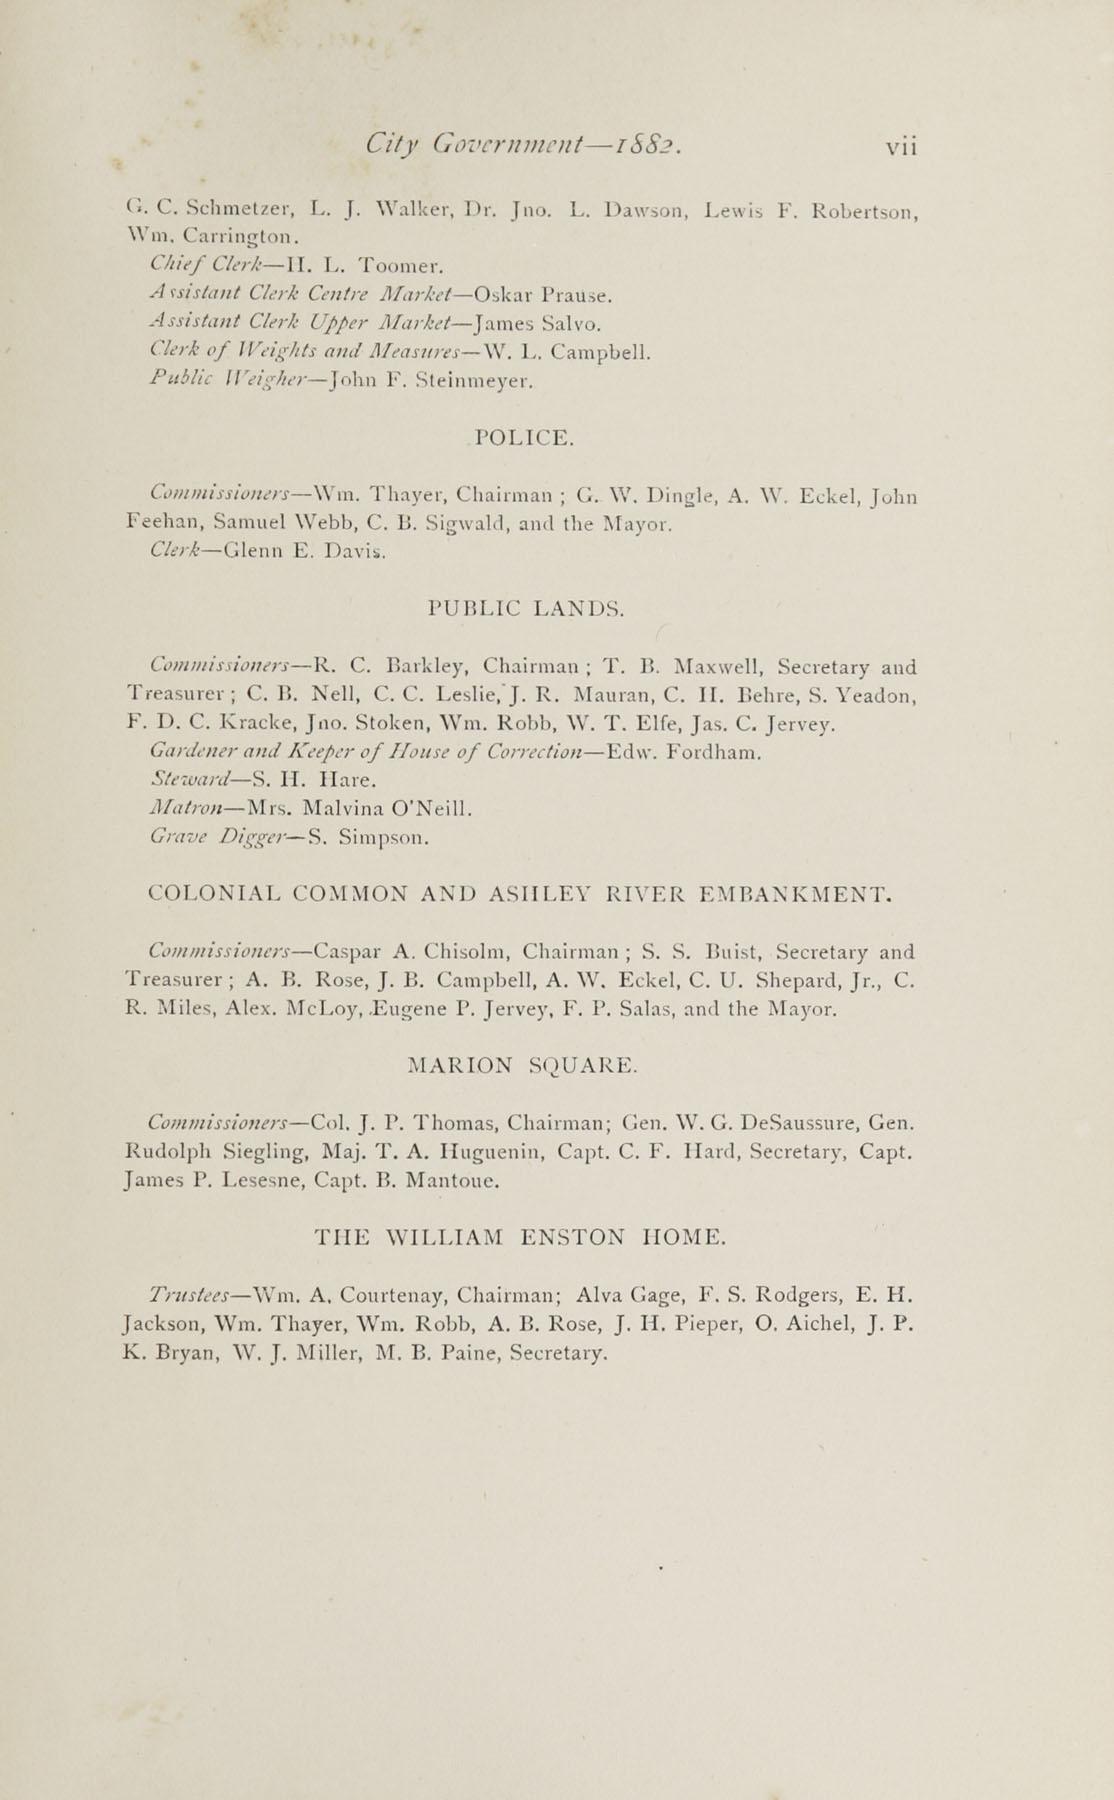 Charleston Yearbook, 1882, page vii